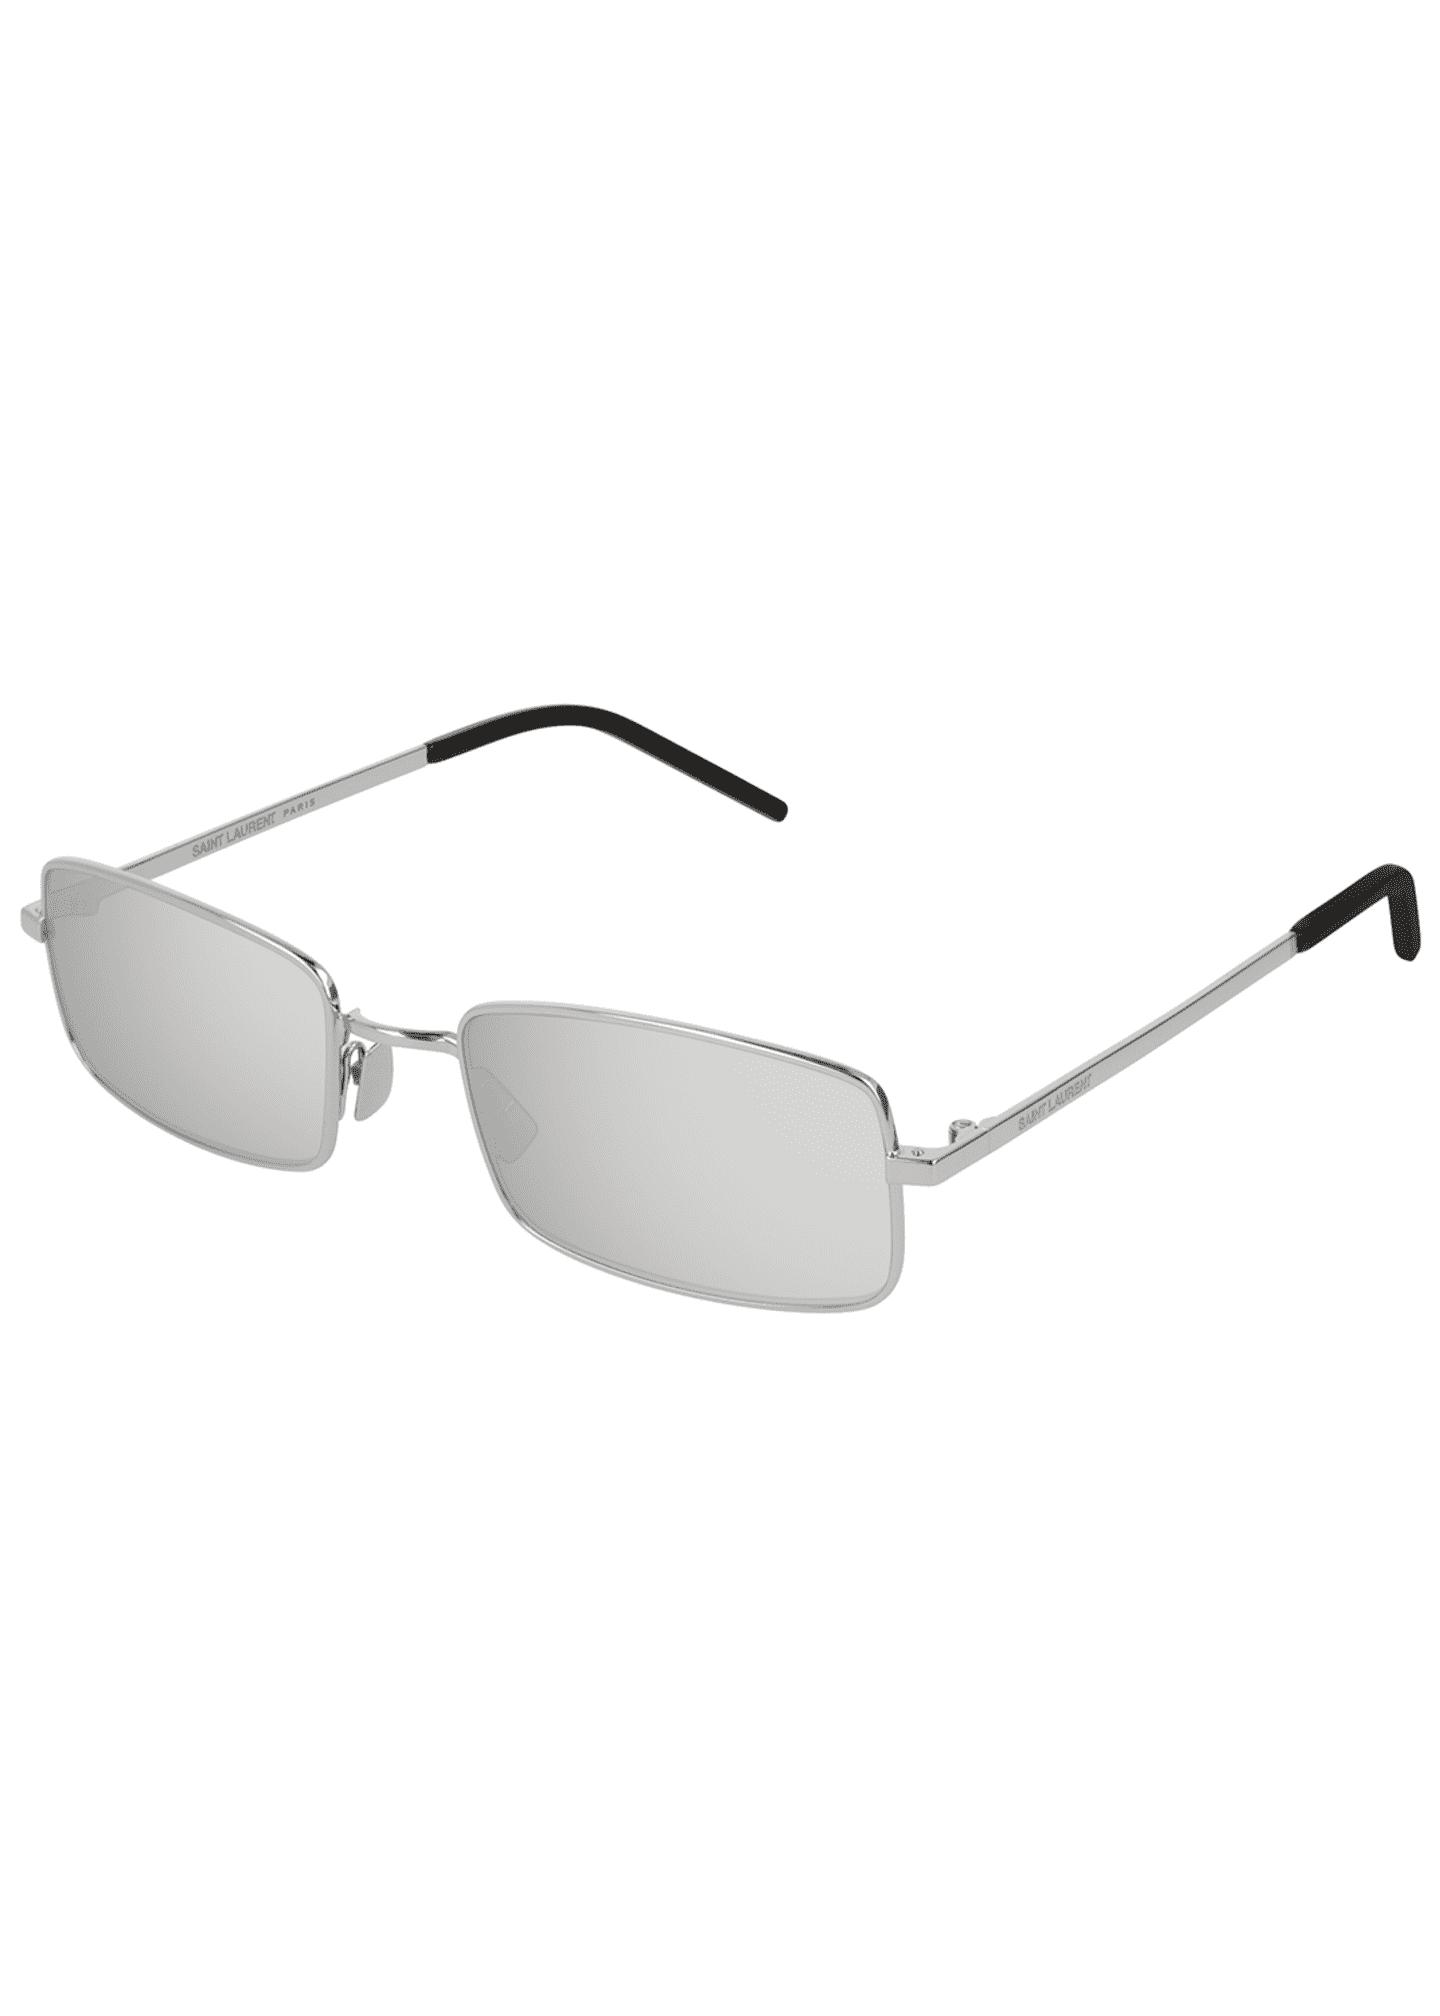 Saint Laurent Slim Rectangle Sunglasses